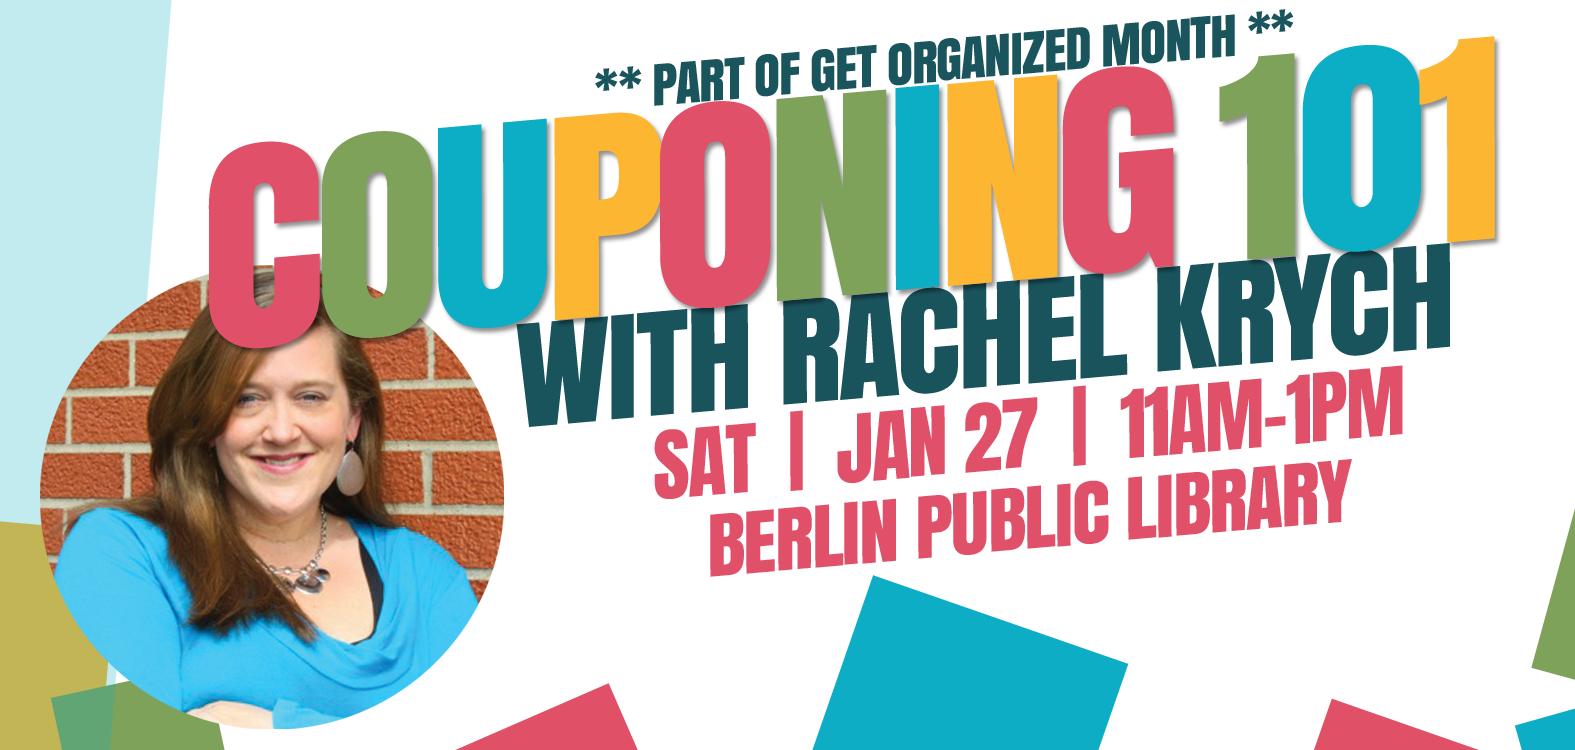 2018-01-ADULT-Berlin-Couponing-Slide